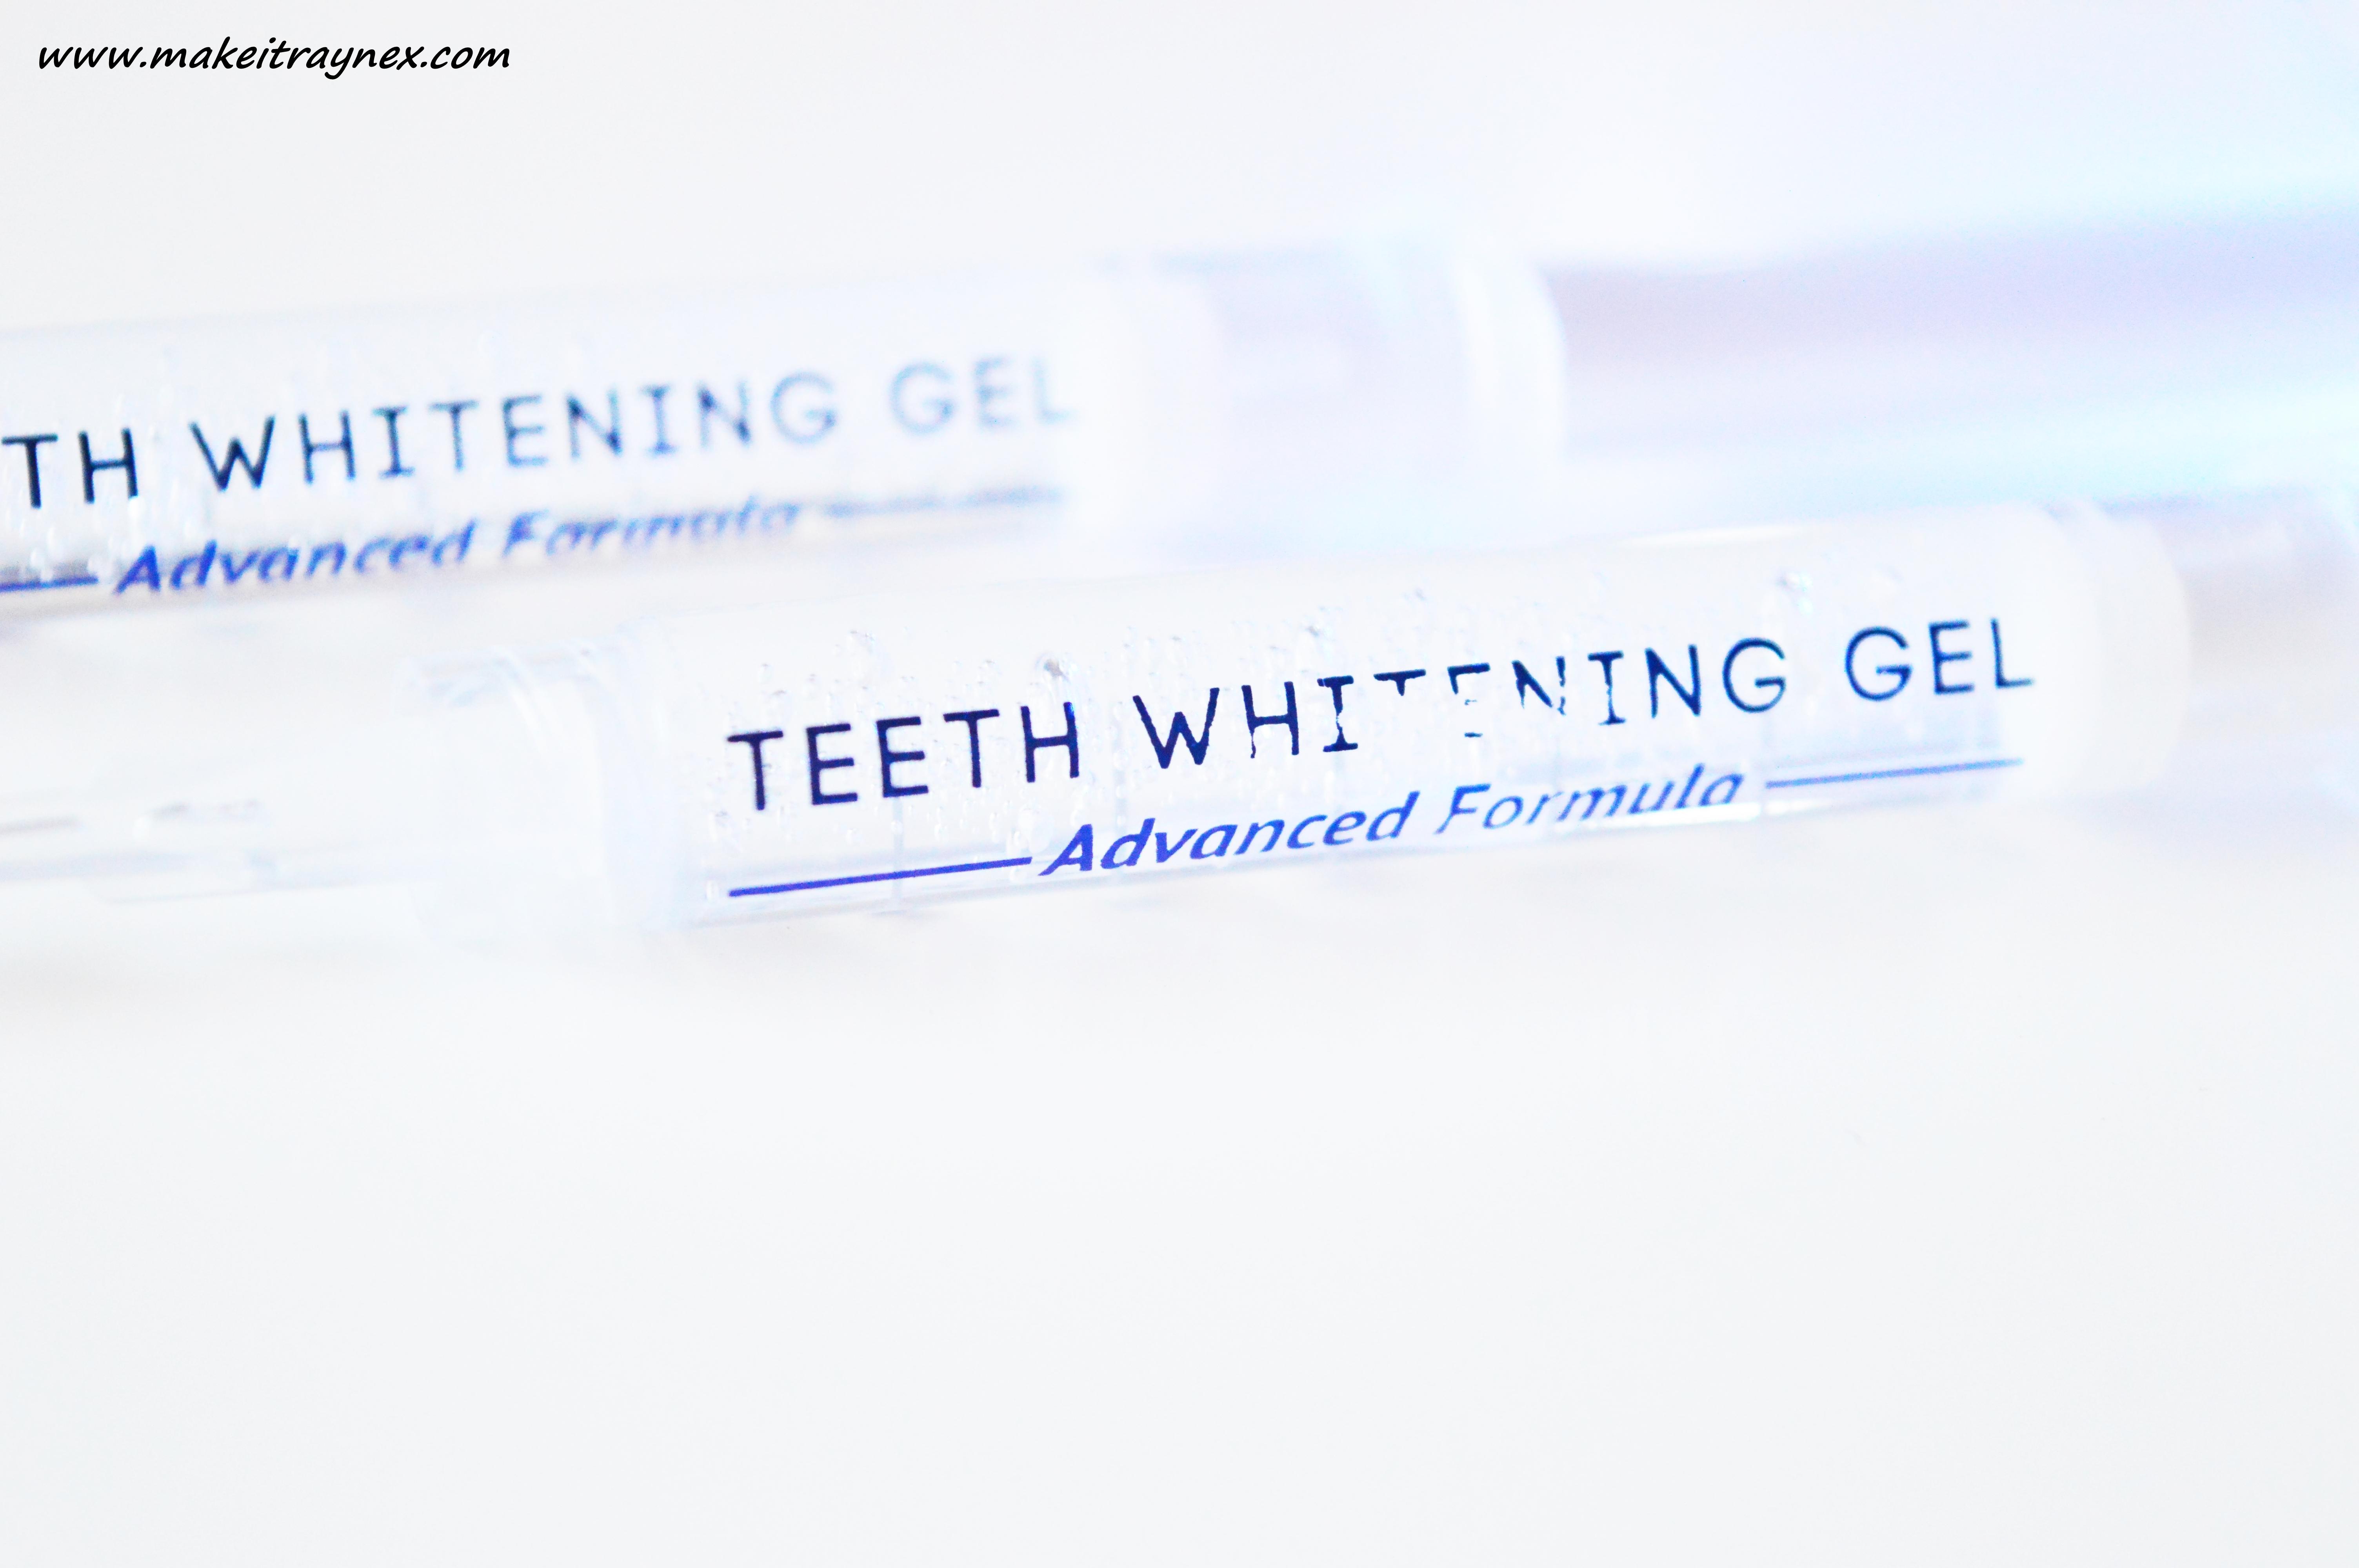 Express Smile Atlanta – Home in One Teeth Whitening Kit {REVIEW}